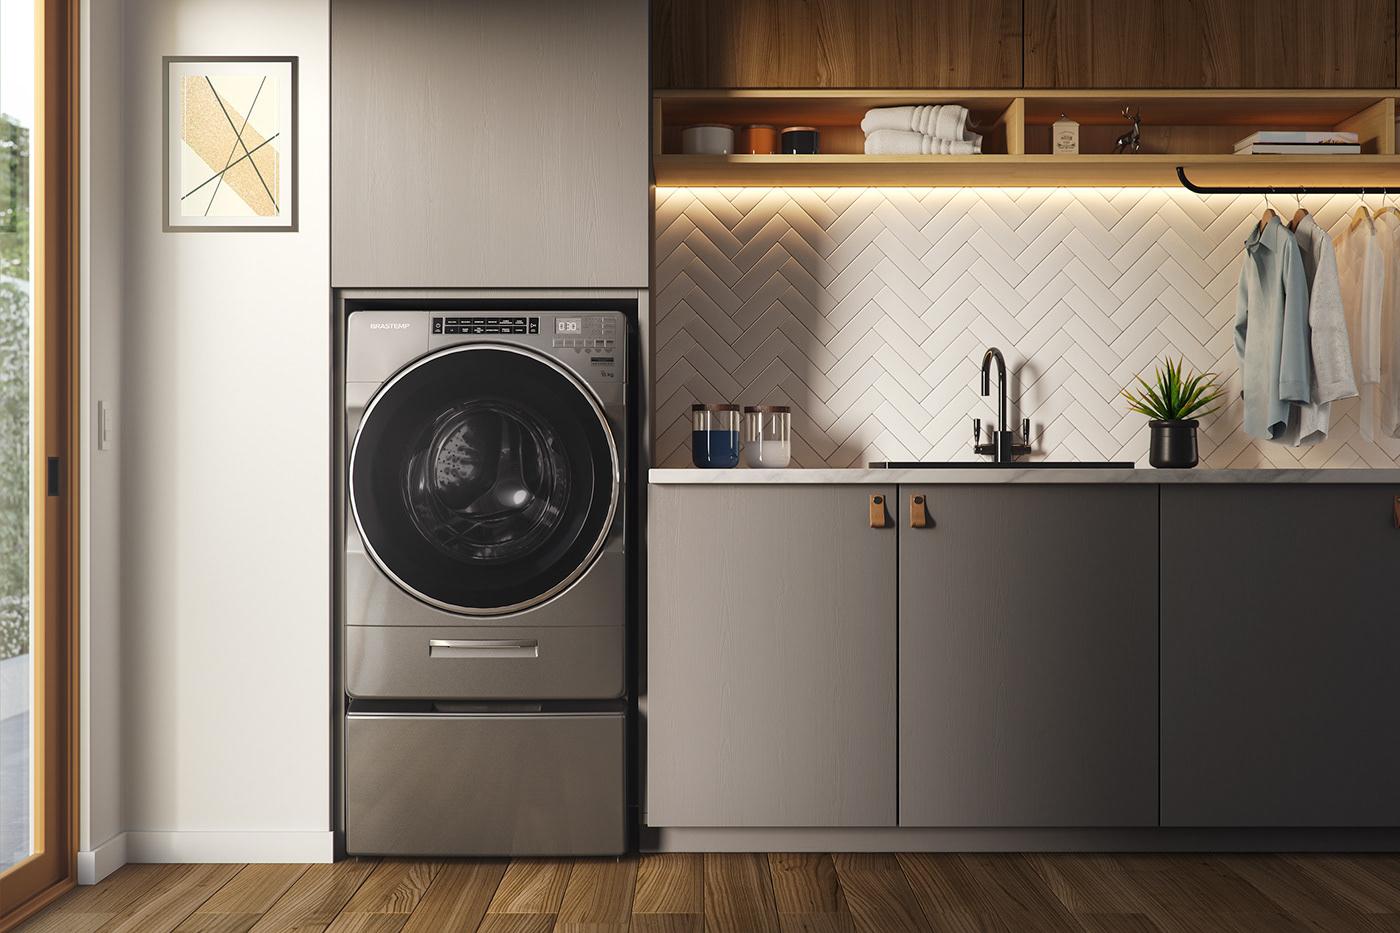 3D animation  brastemp CGI laundry machine Miagui product wash whirlpool